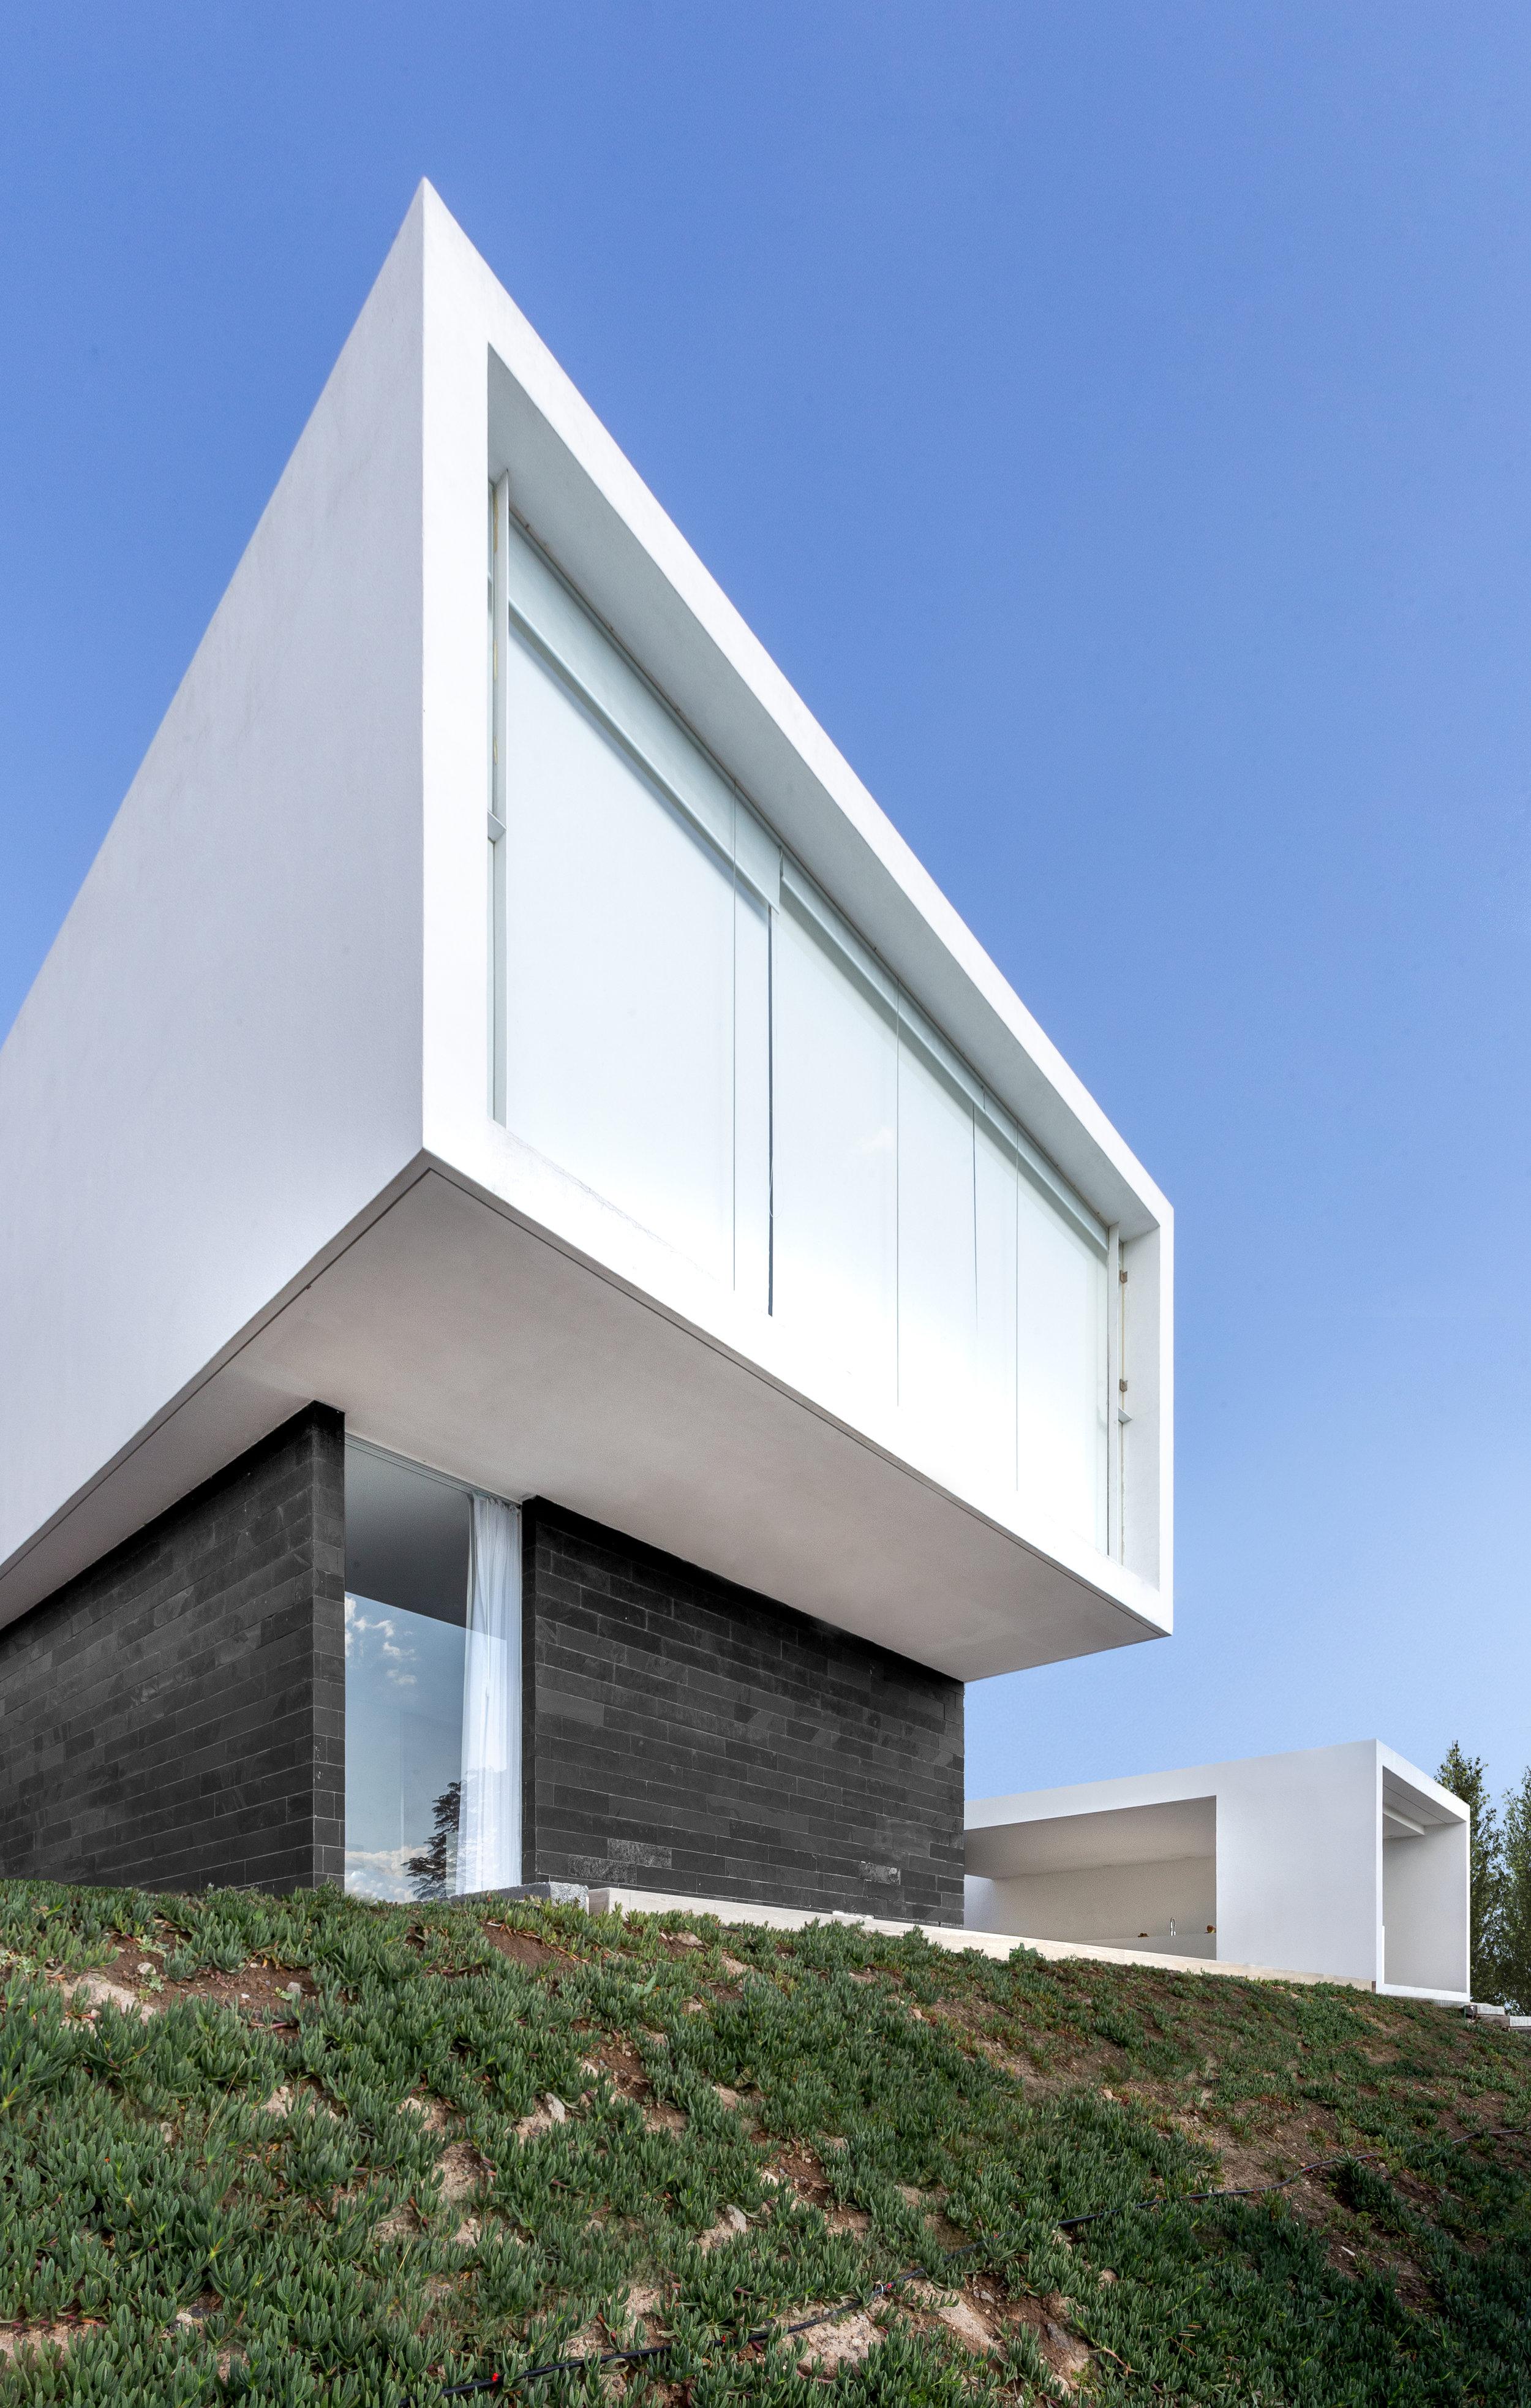 Casa Santa Barbara-HWStudio-04-2.jpg